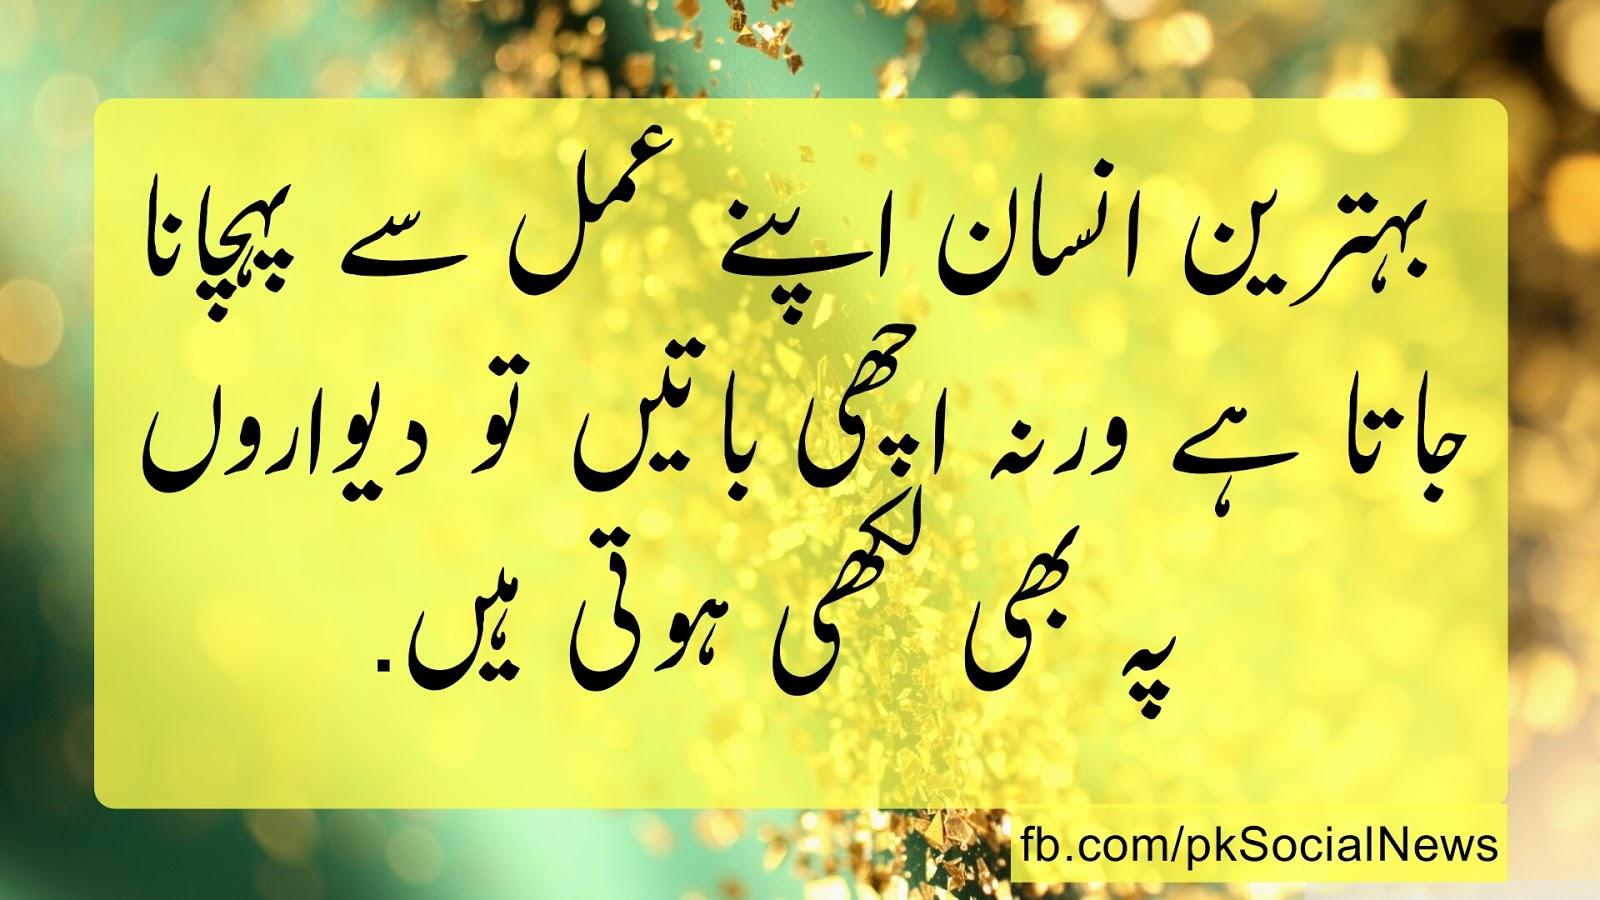 Top 10 Love Quotes Top 10 Famous Urdu Quotes  Myk Star